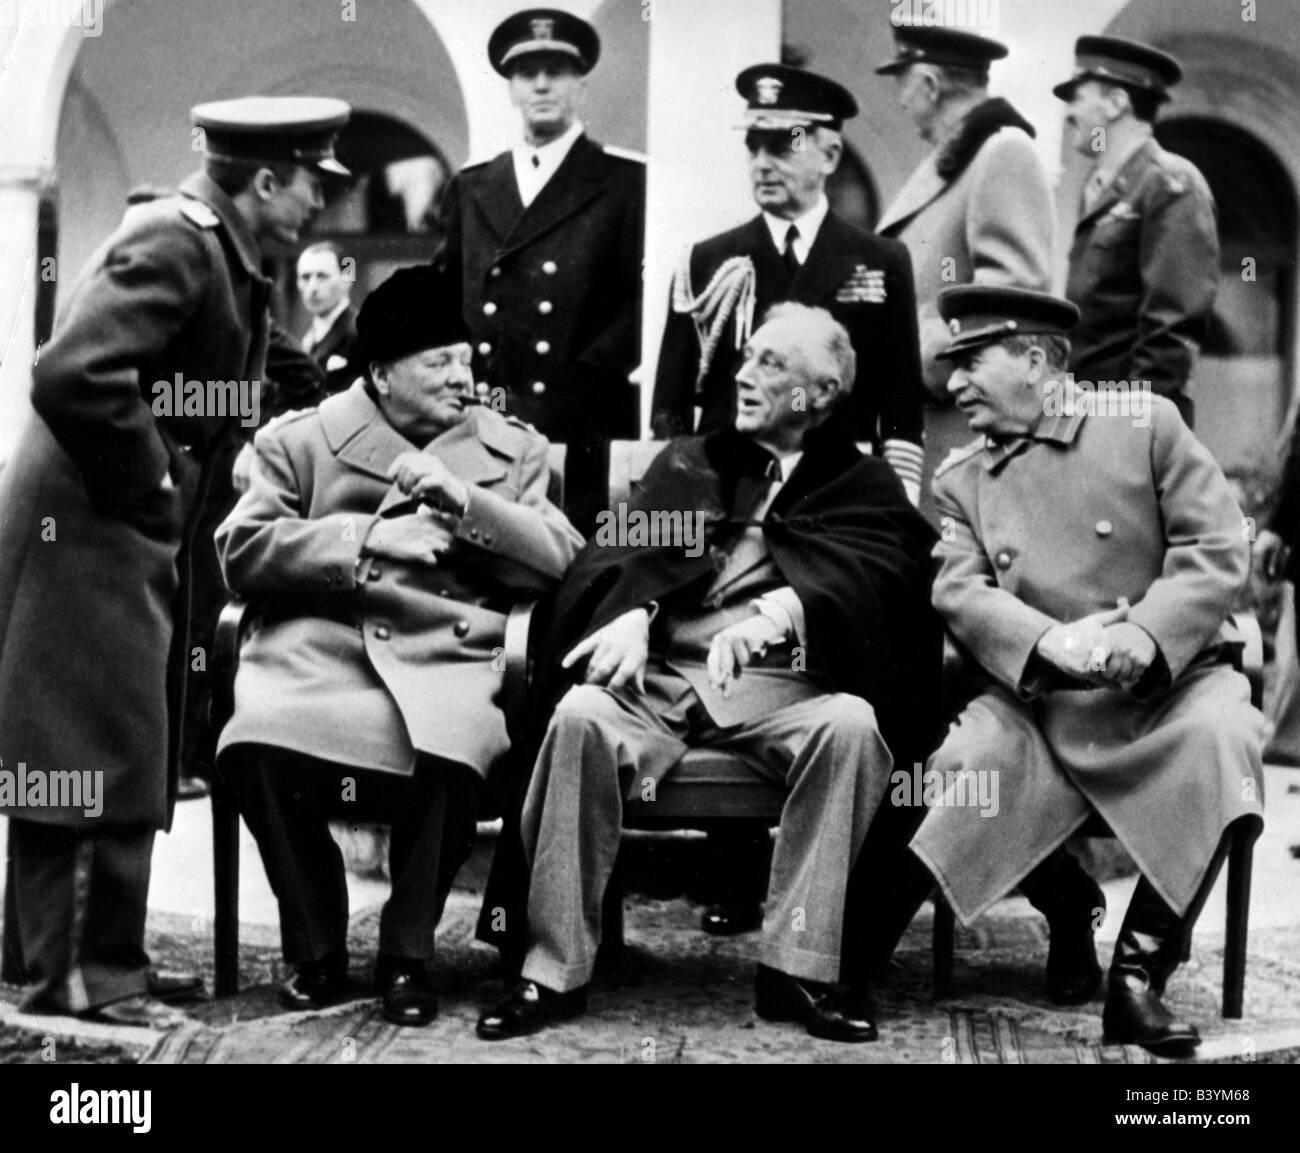 events, Second World War / WWII, conferences, Yalta Conference, 4.2.1945 - 11.2.1945, interpreter Vladimir Pavlov, Stock Photo